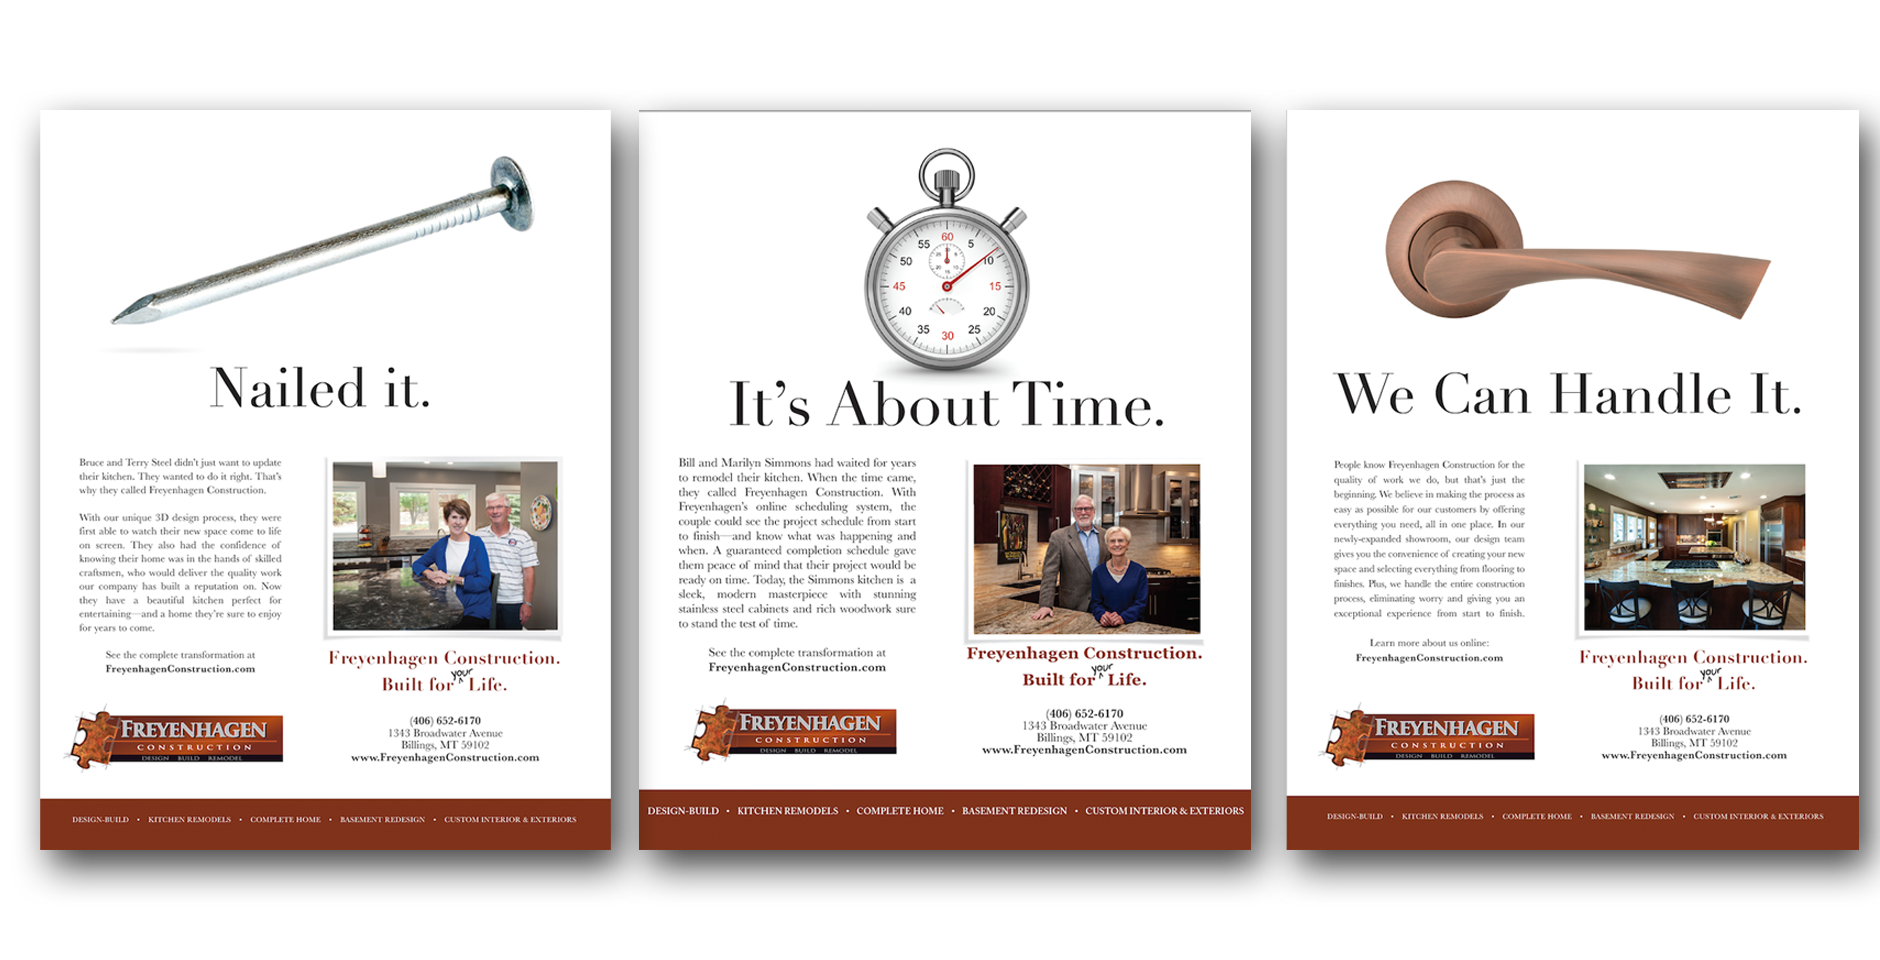 Freyenhagen Construction Print Ads with Box 117 Creative, Billings, MT